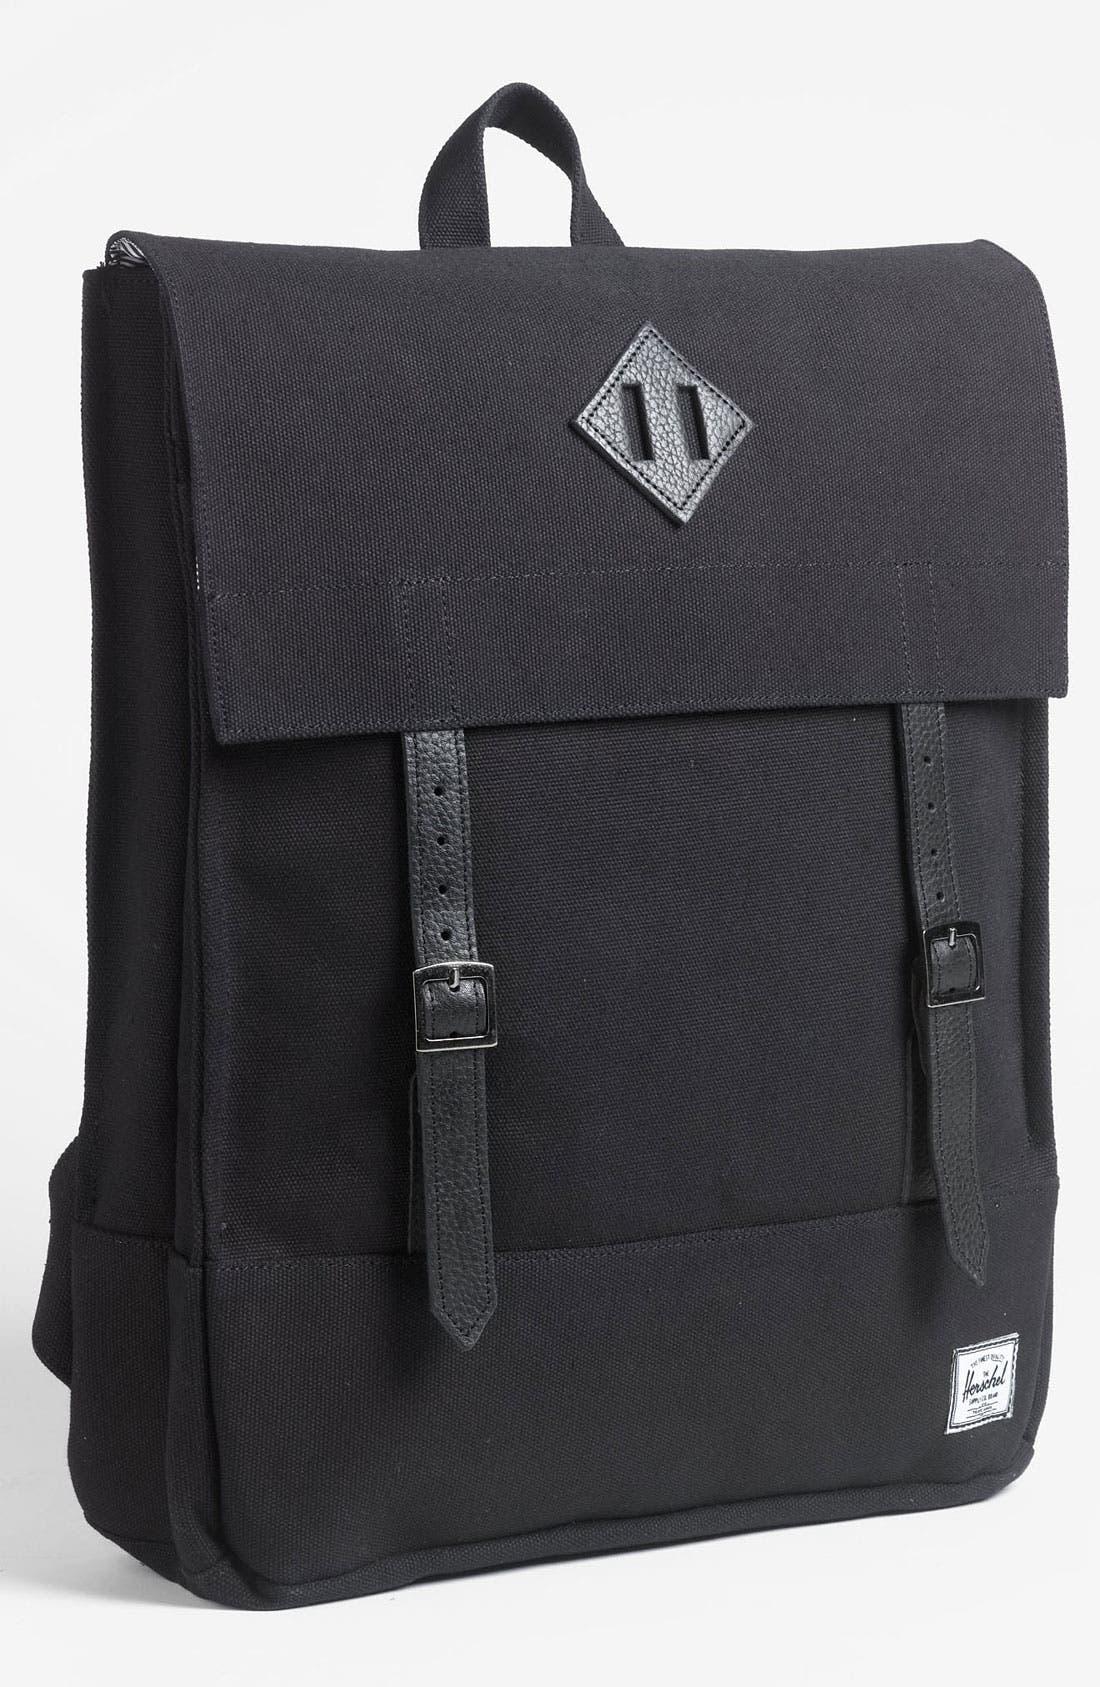 Main Image - Herschel Supply Co. 'Survey' Backpack